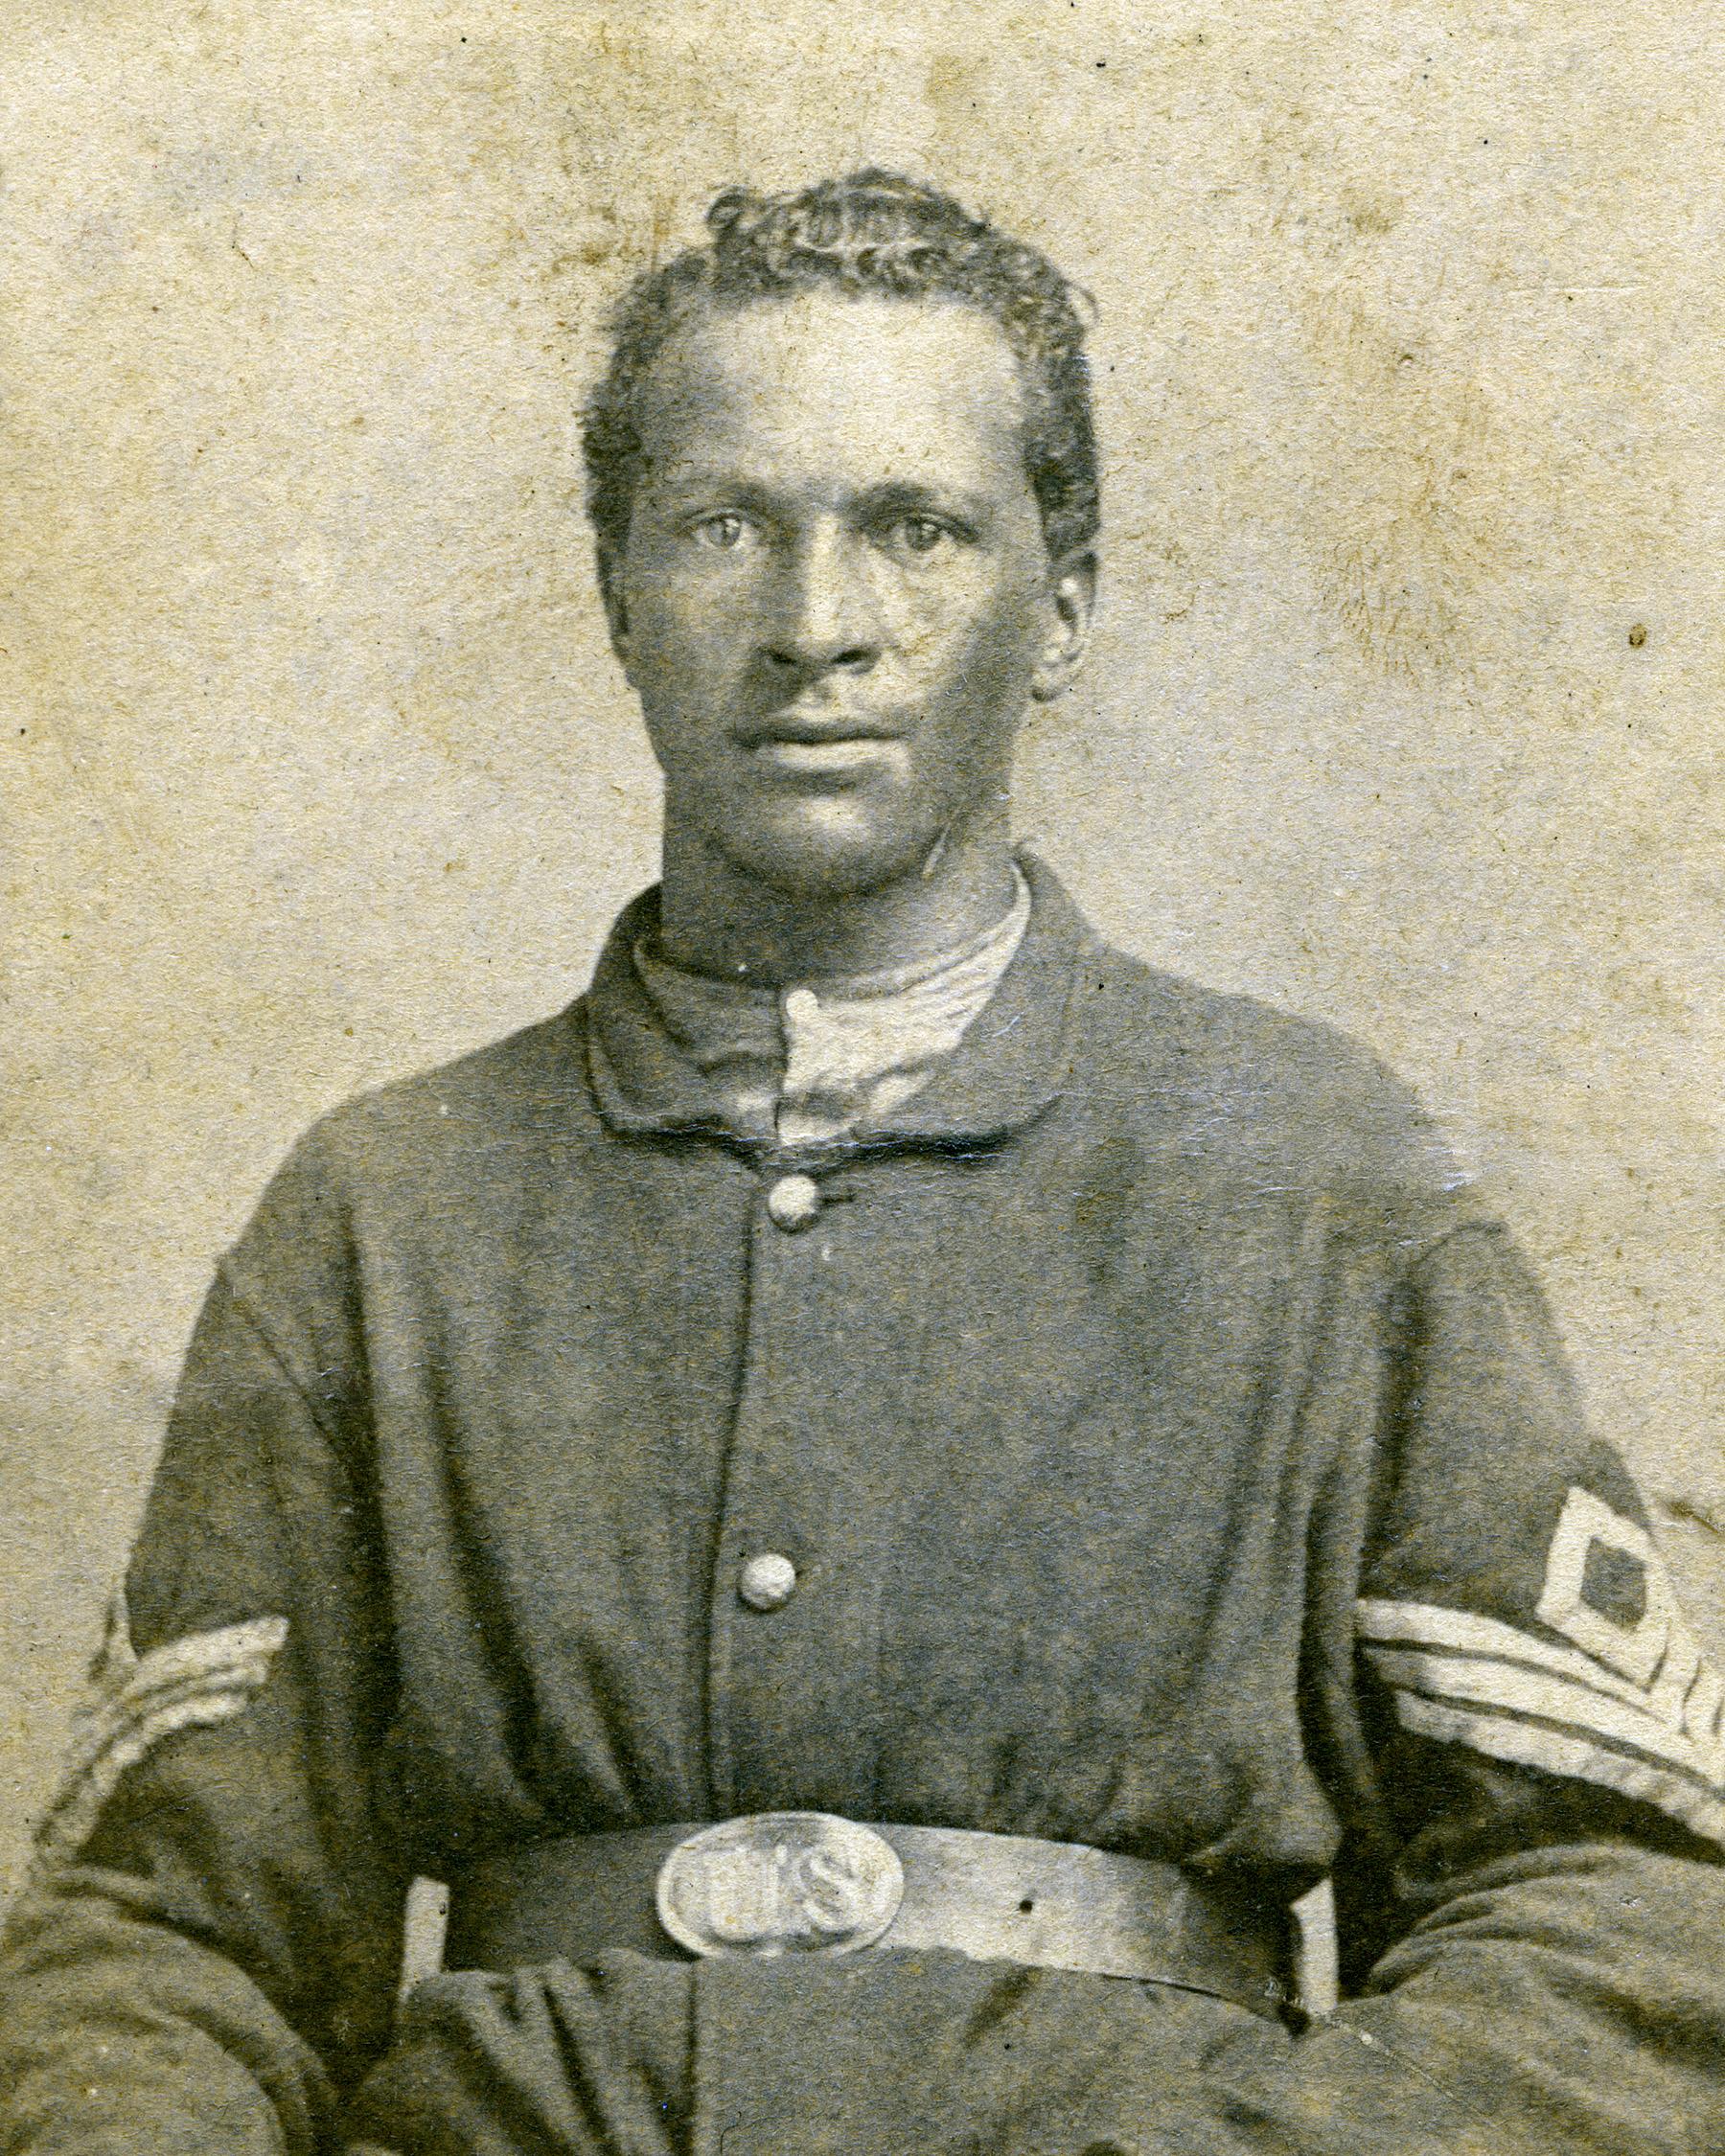 Sergeant William Messley